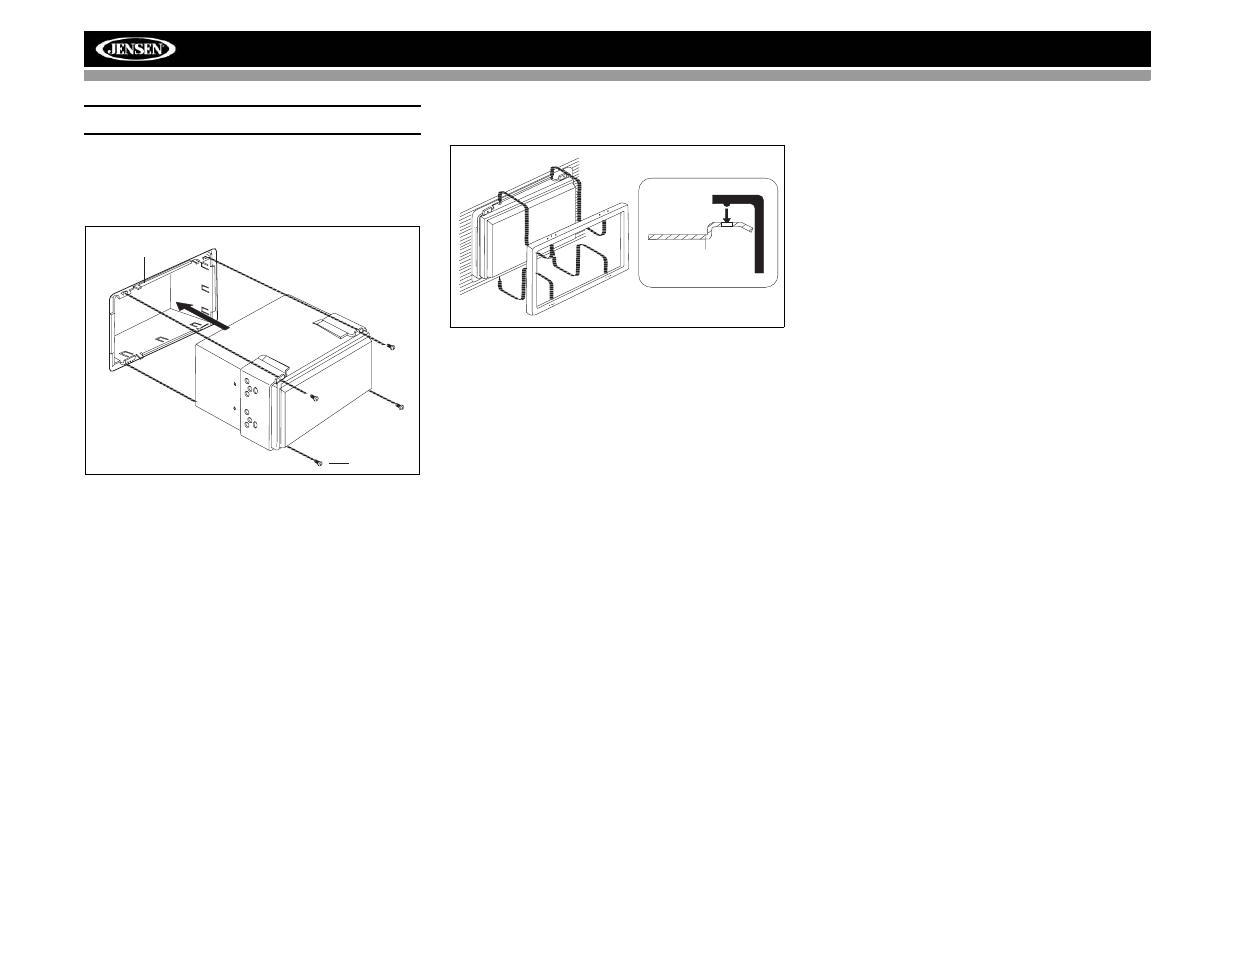 Vm9022   Jensen VM9022 User Manual   Page 10 / 124 on